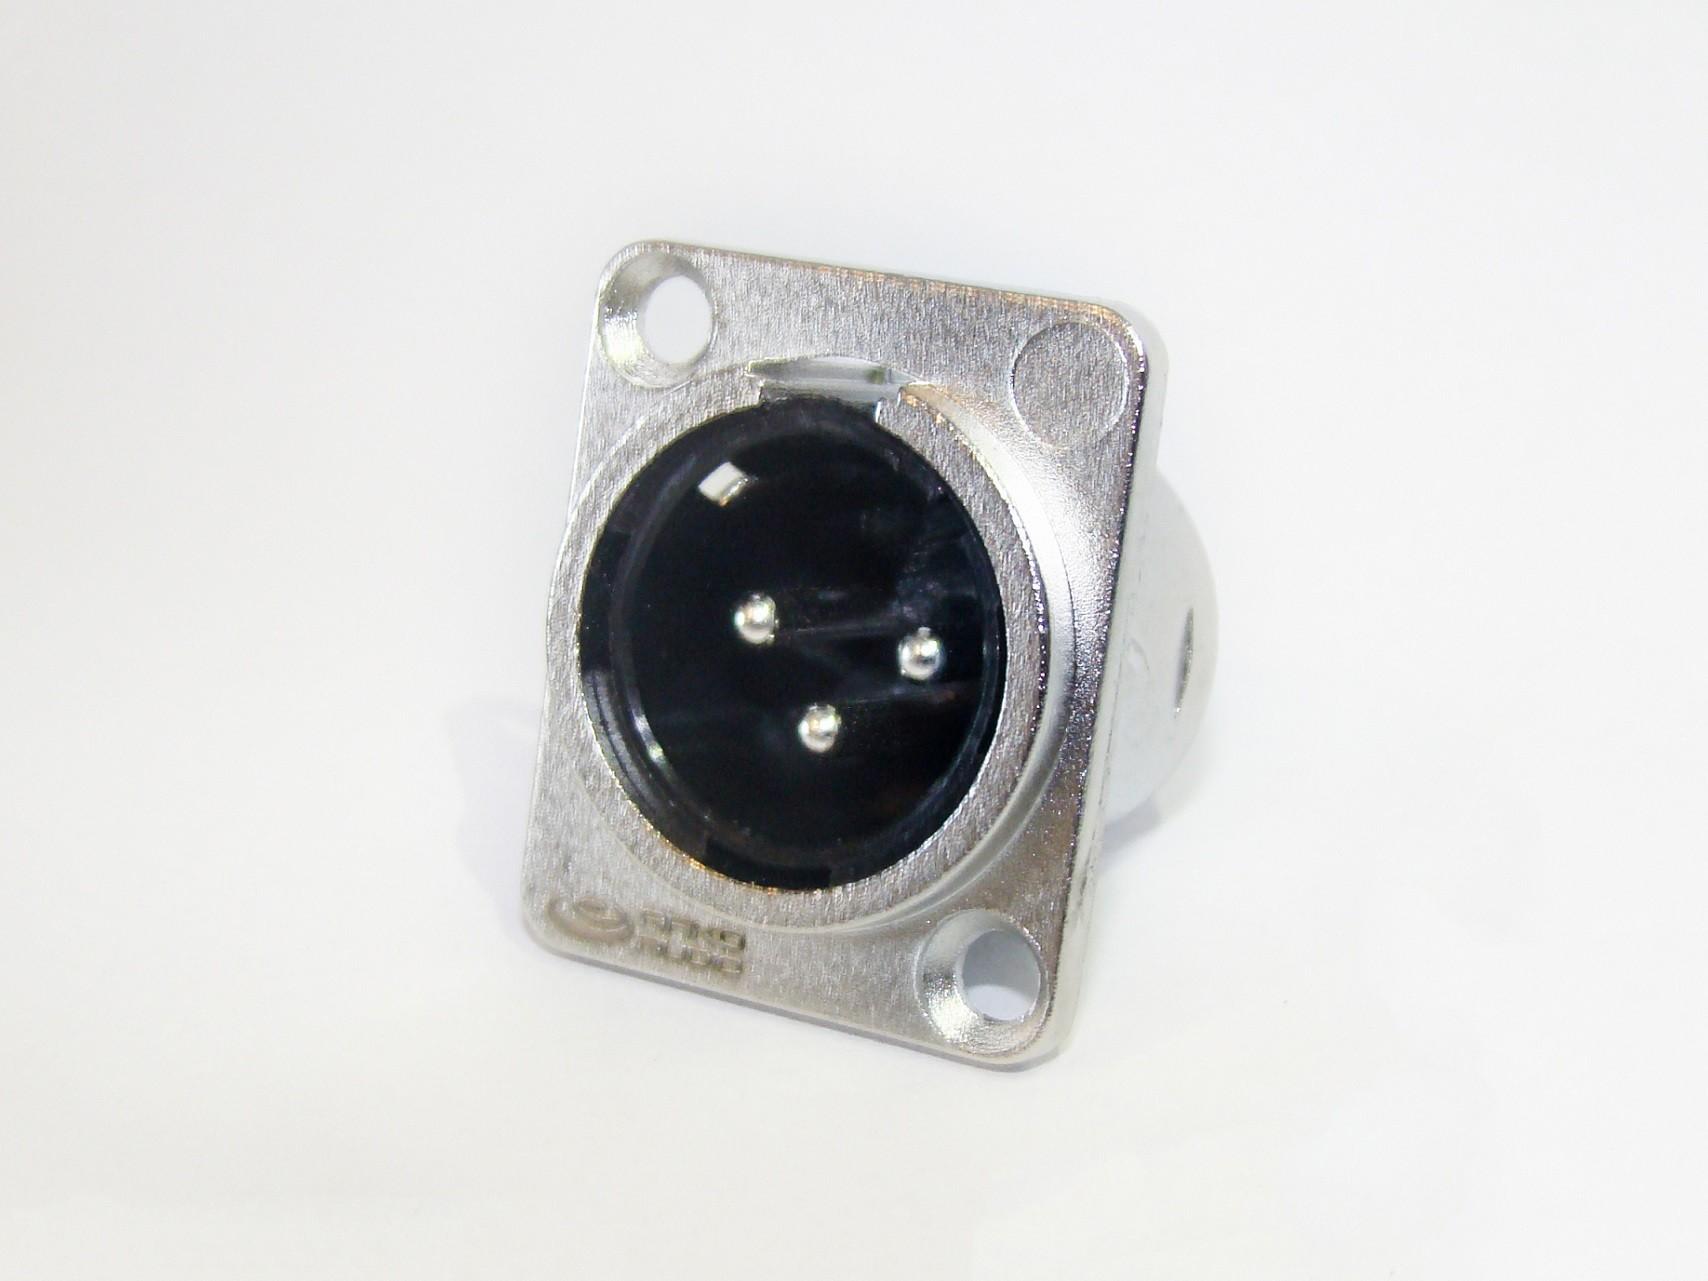 Conector XLR 3 Polos - Macho de Painel - AK XLR3MP - ARKO AUDIO